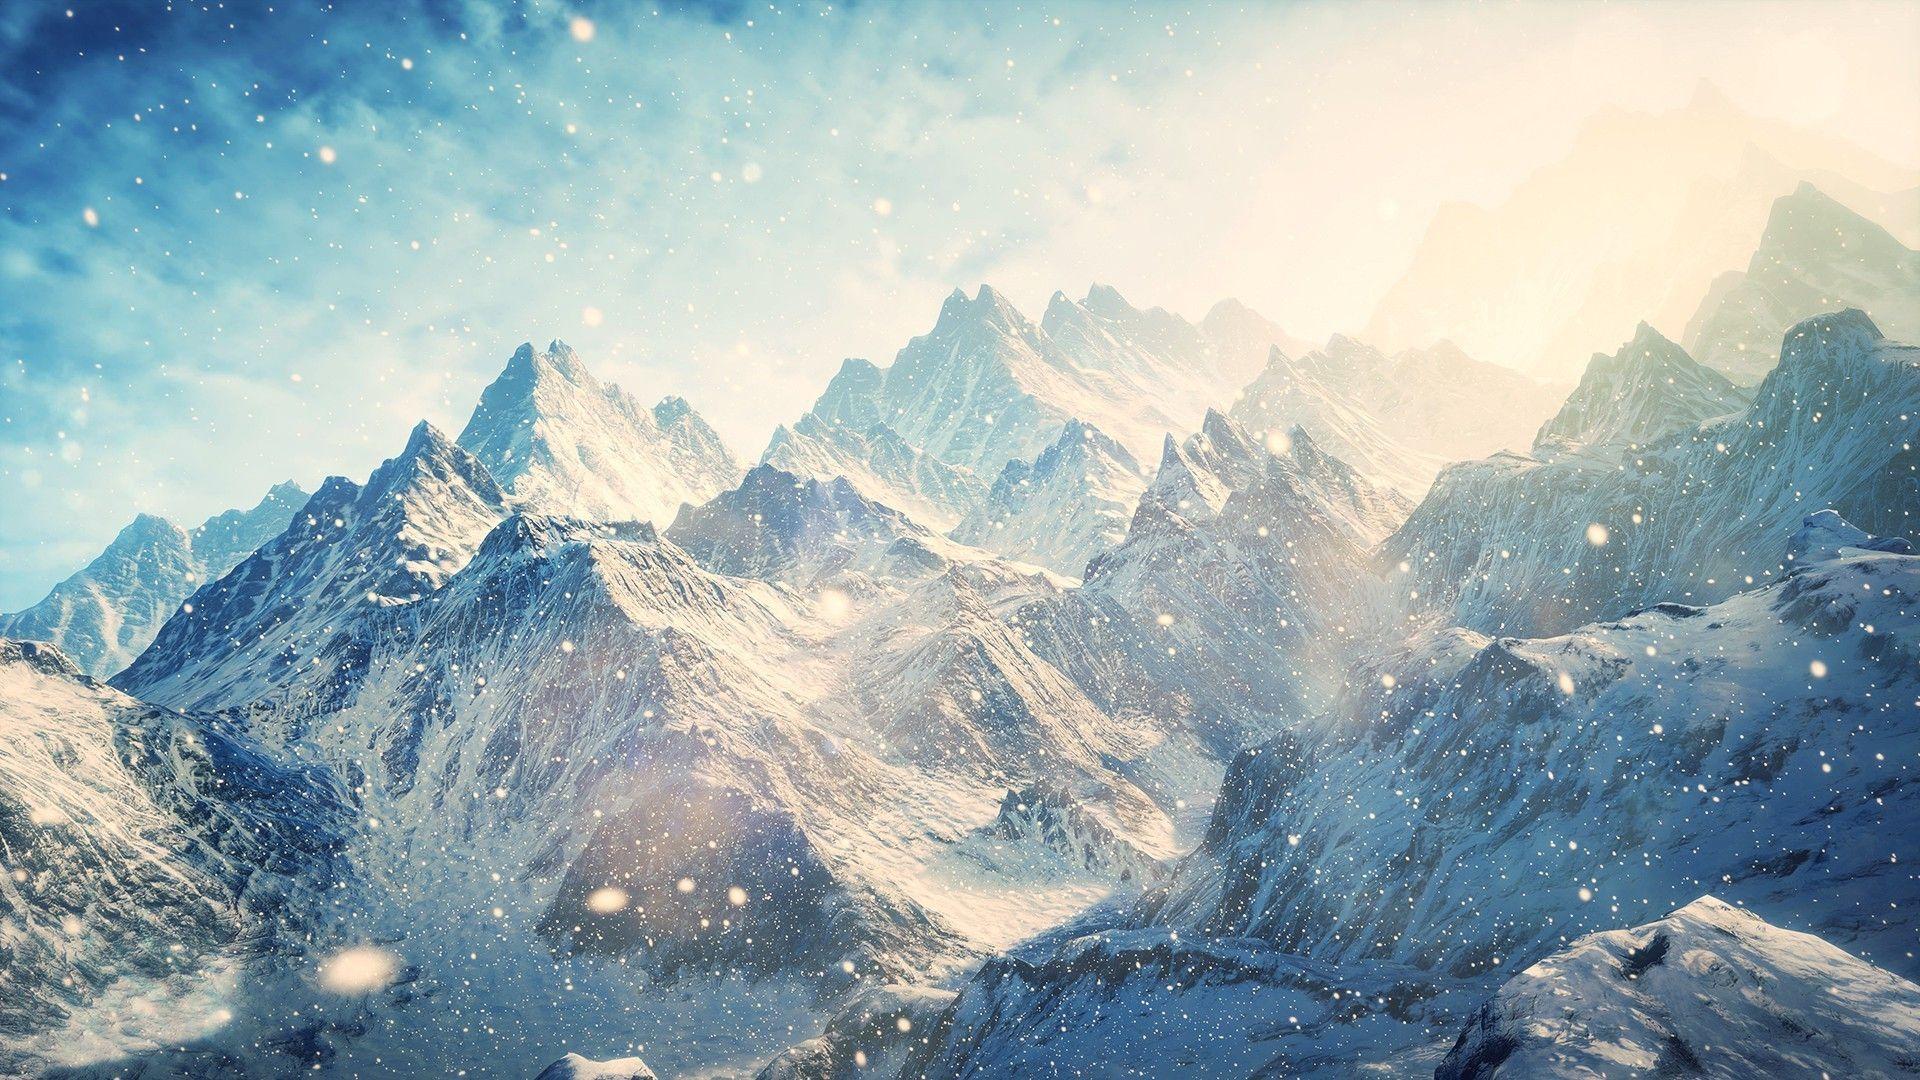 mountain wallpaper hd 1920x1080